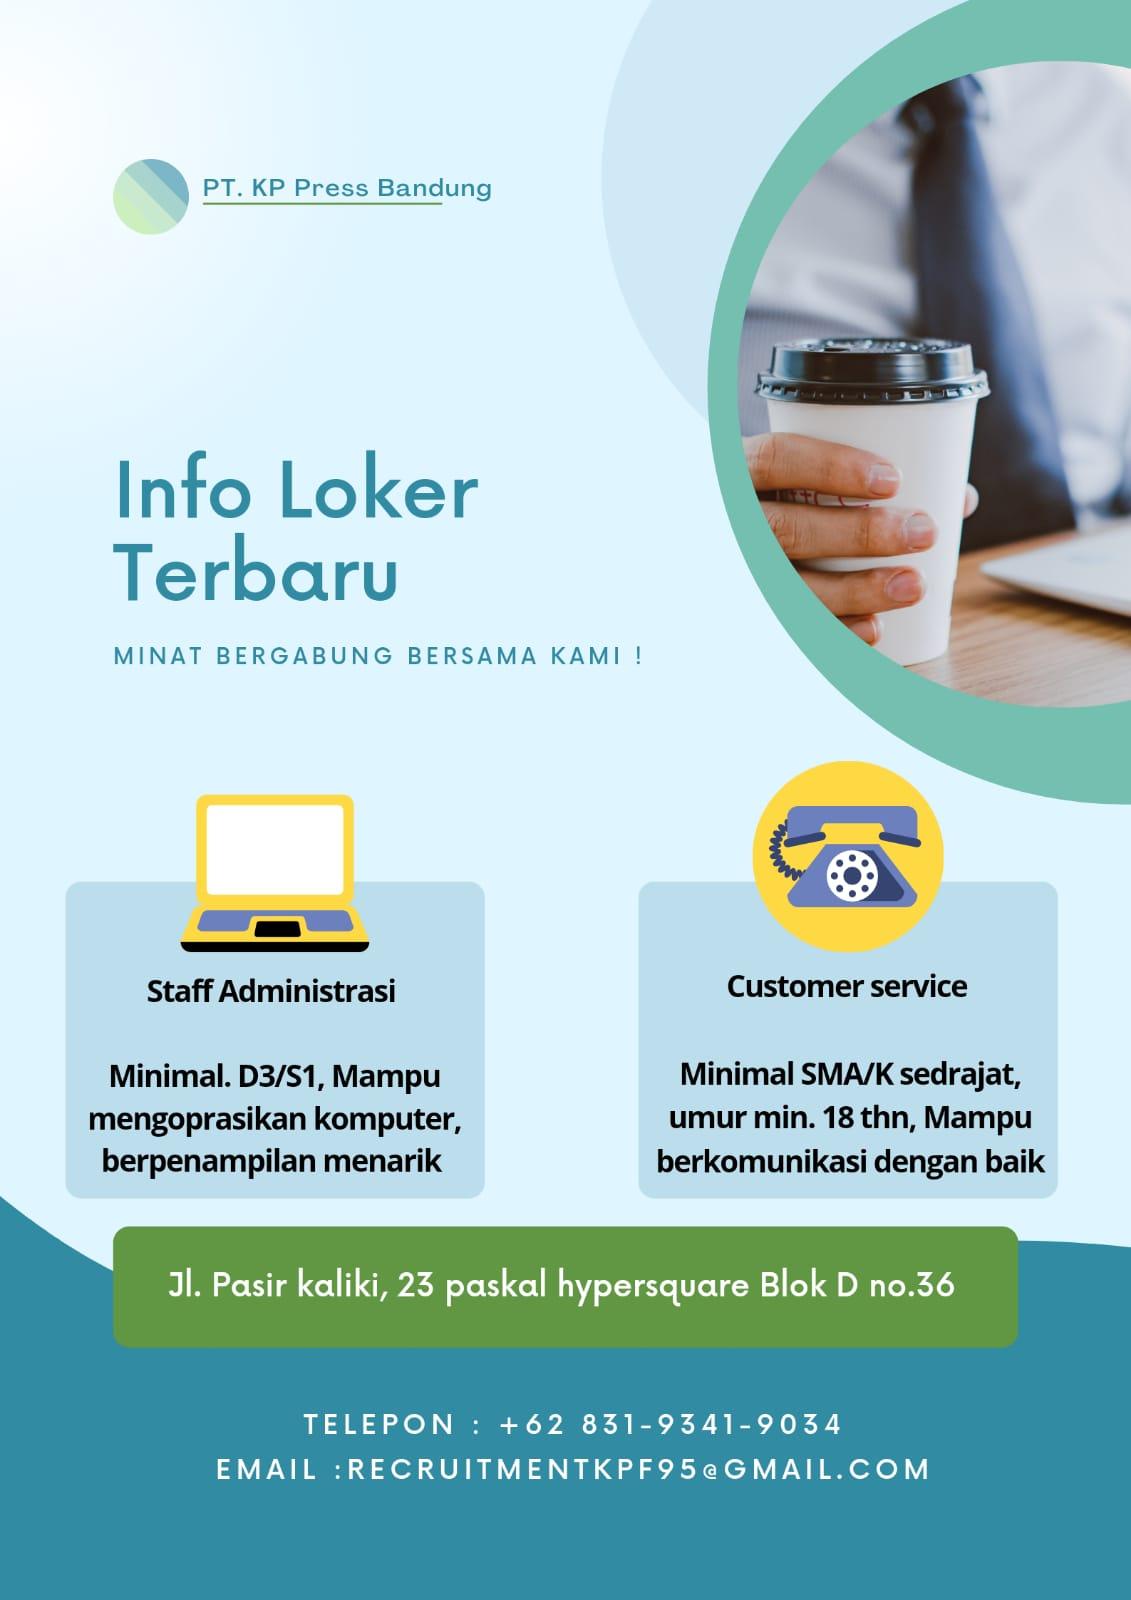 Lowongan Kerja PT. KP Press Bandung Agustus 2021